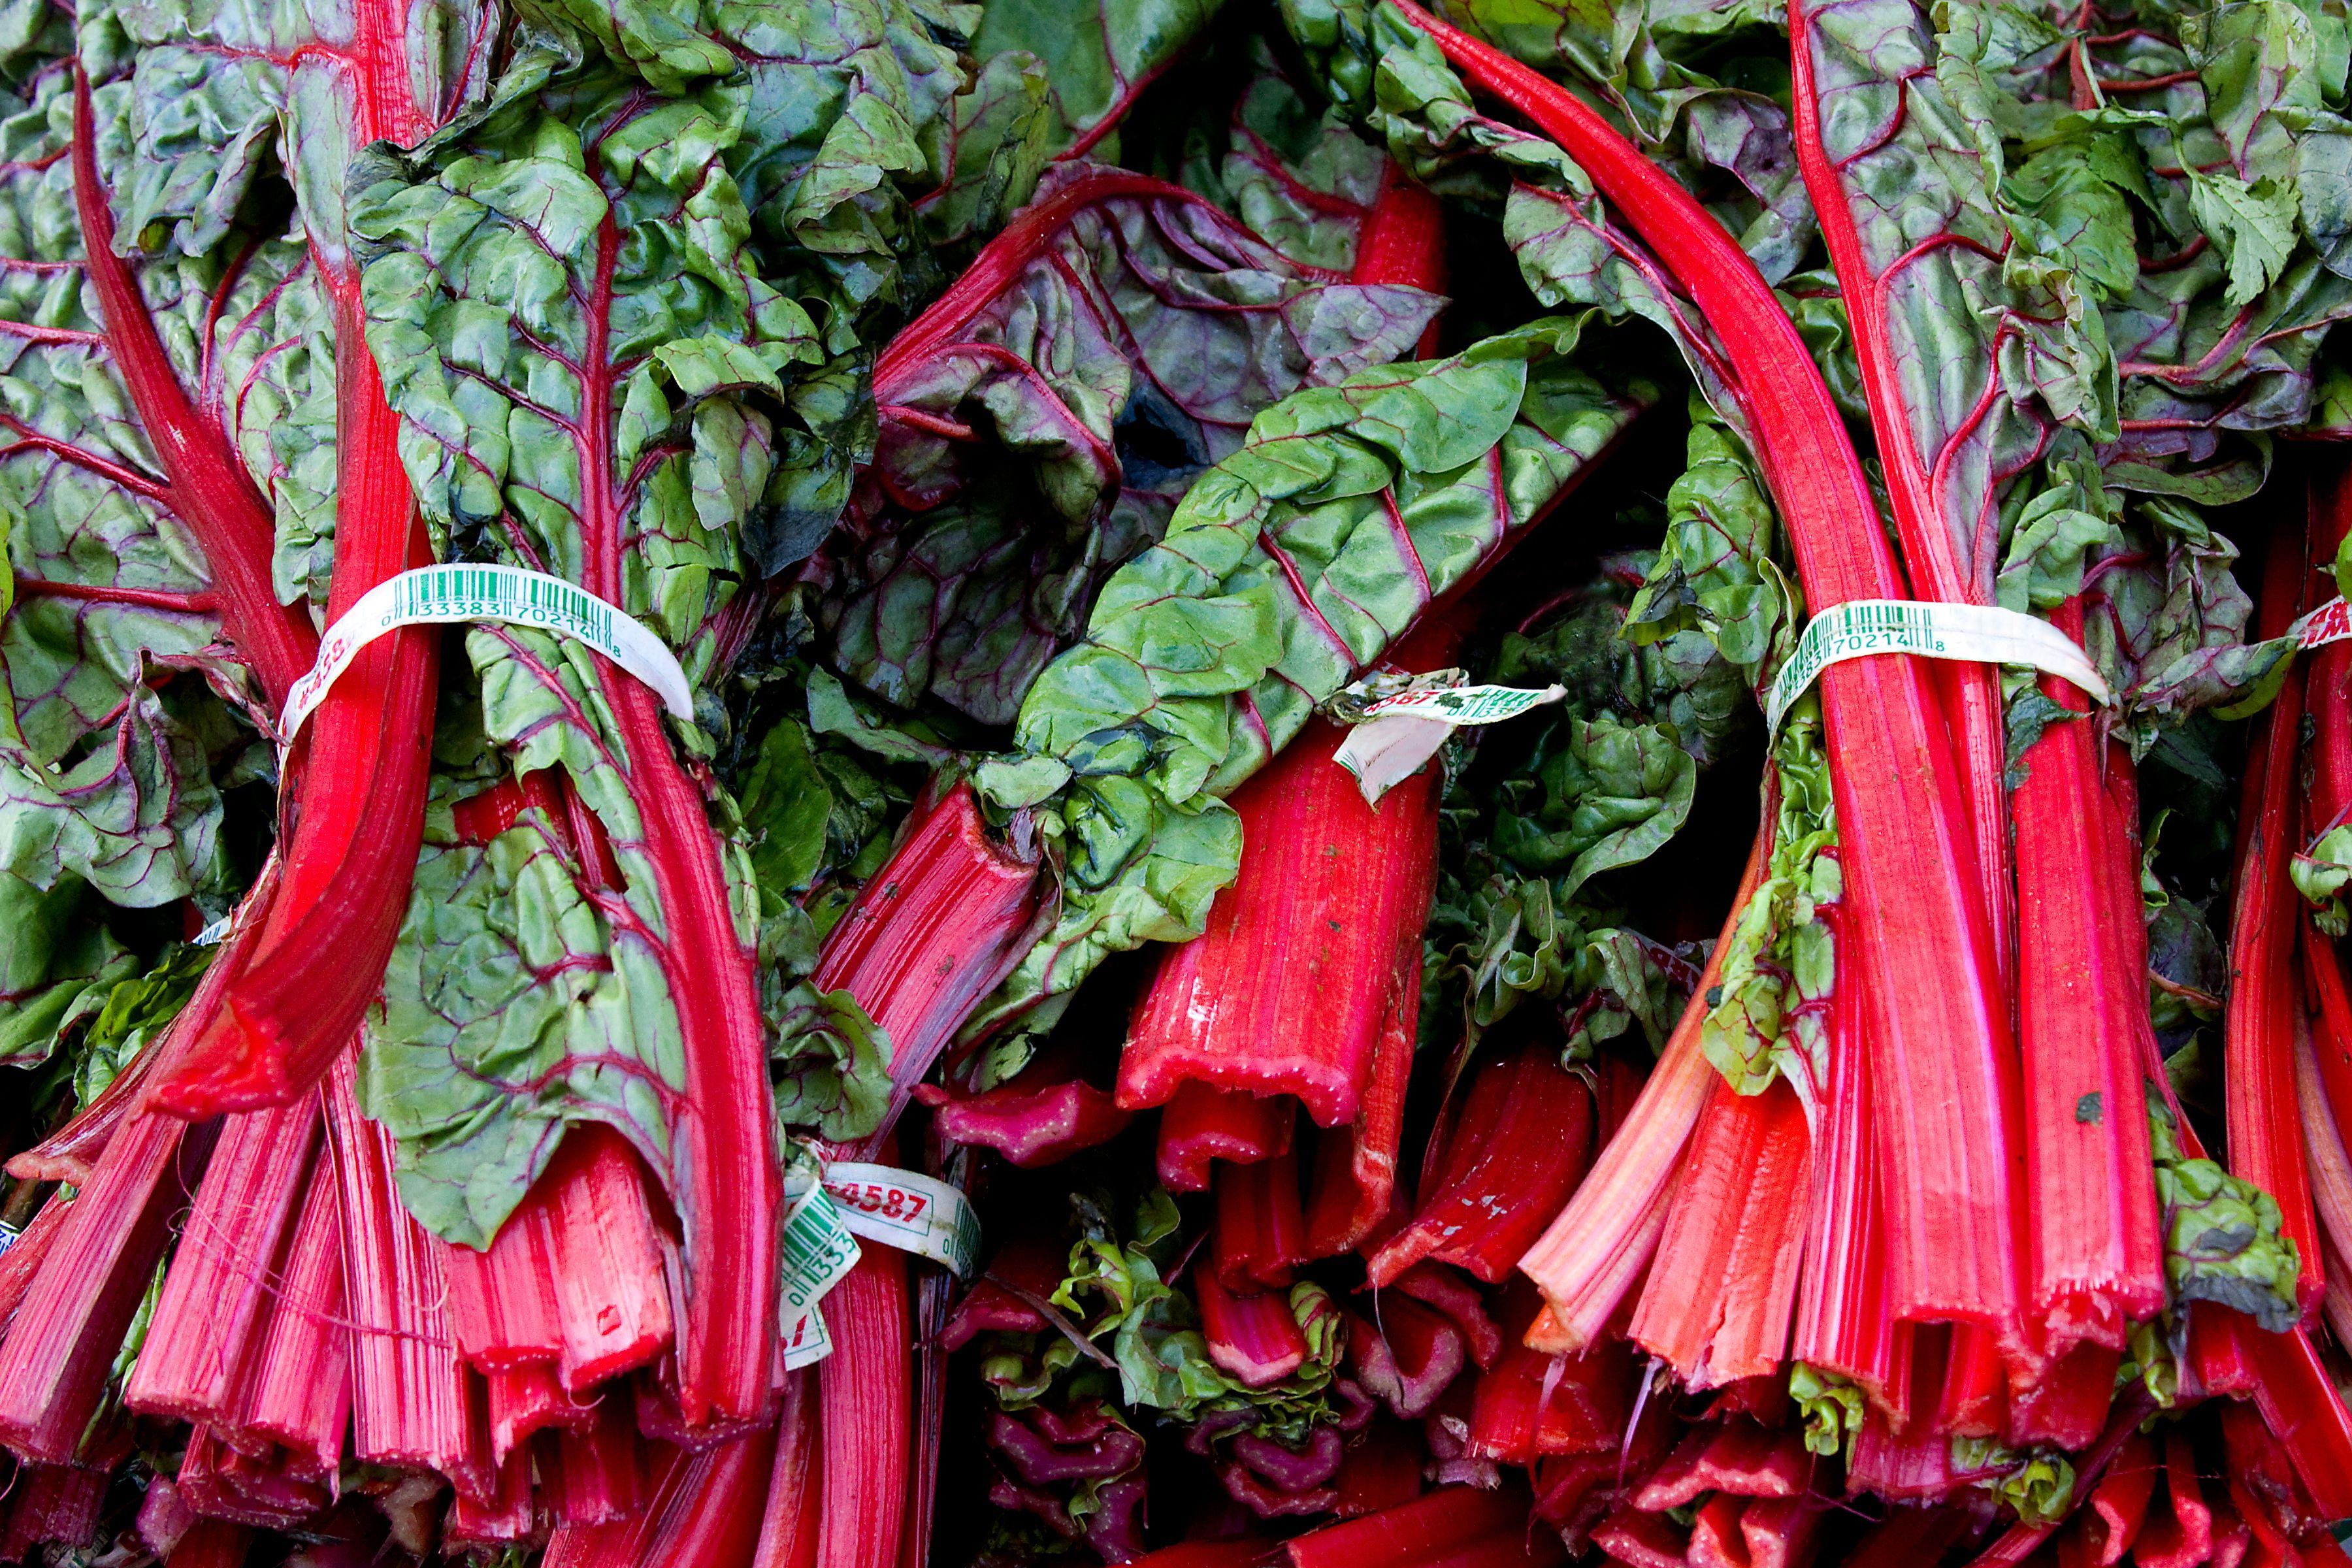 Red Swiss Chard at Market